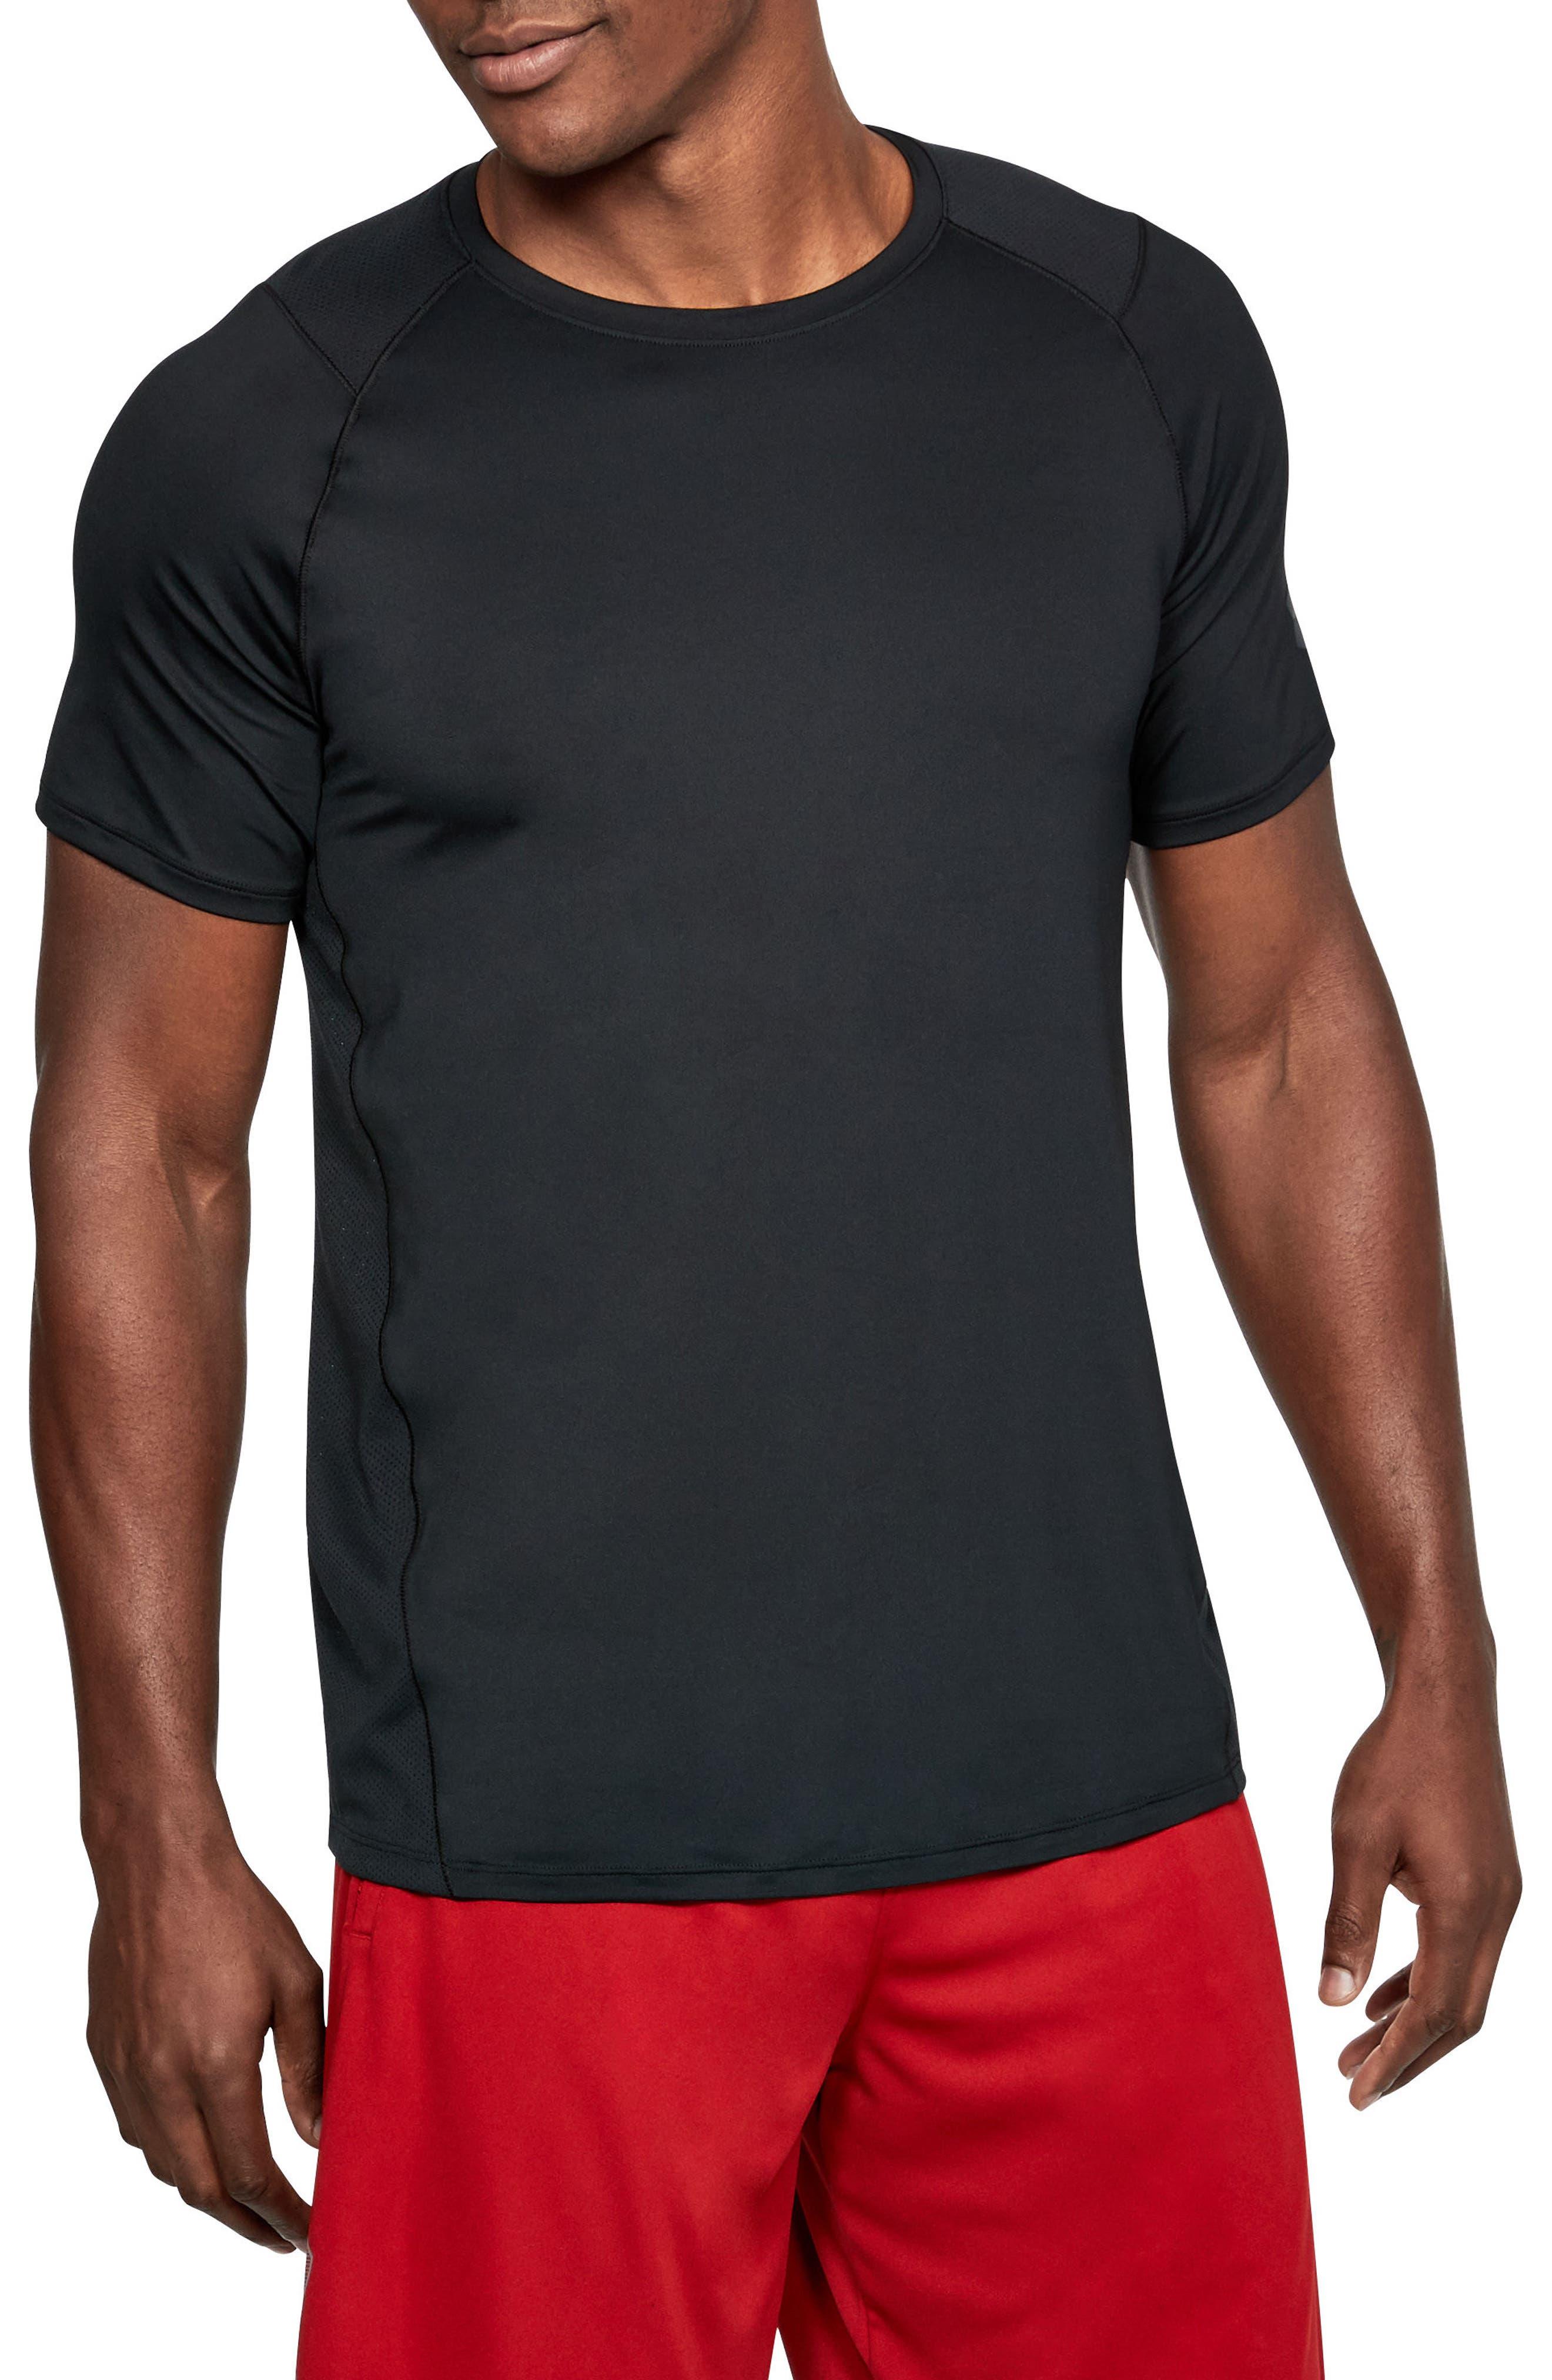 UNDER ARMOUR, Raid 2.0 Crewneck T-Shirt, Main thumbnail 1, color, 001